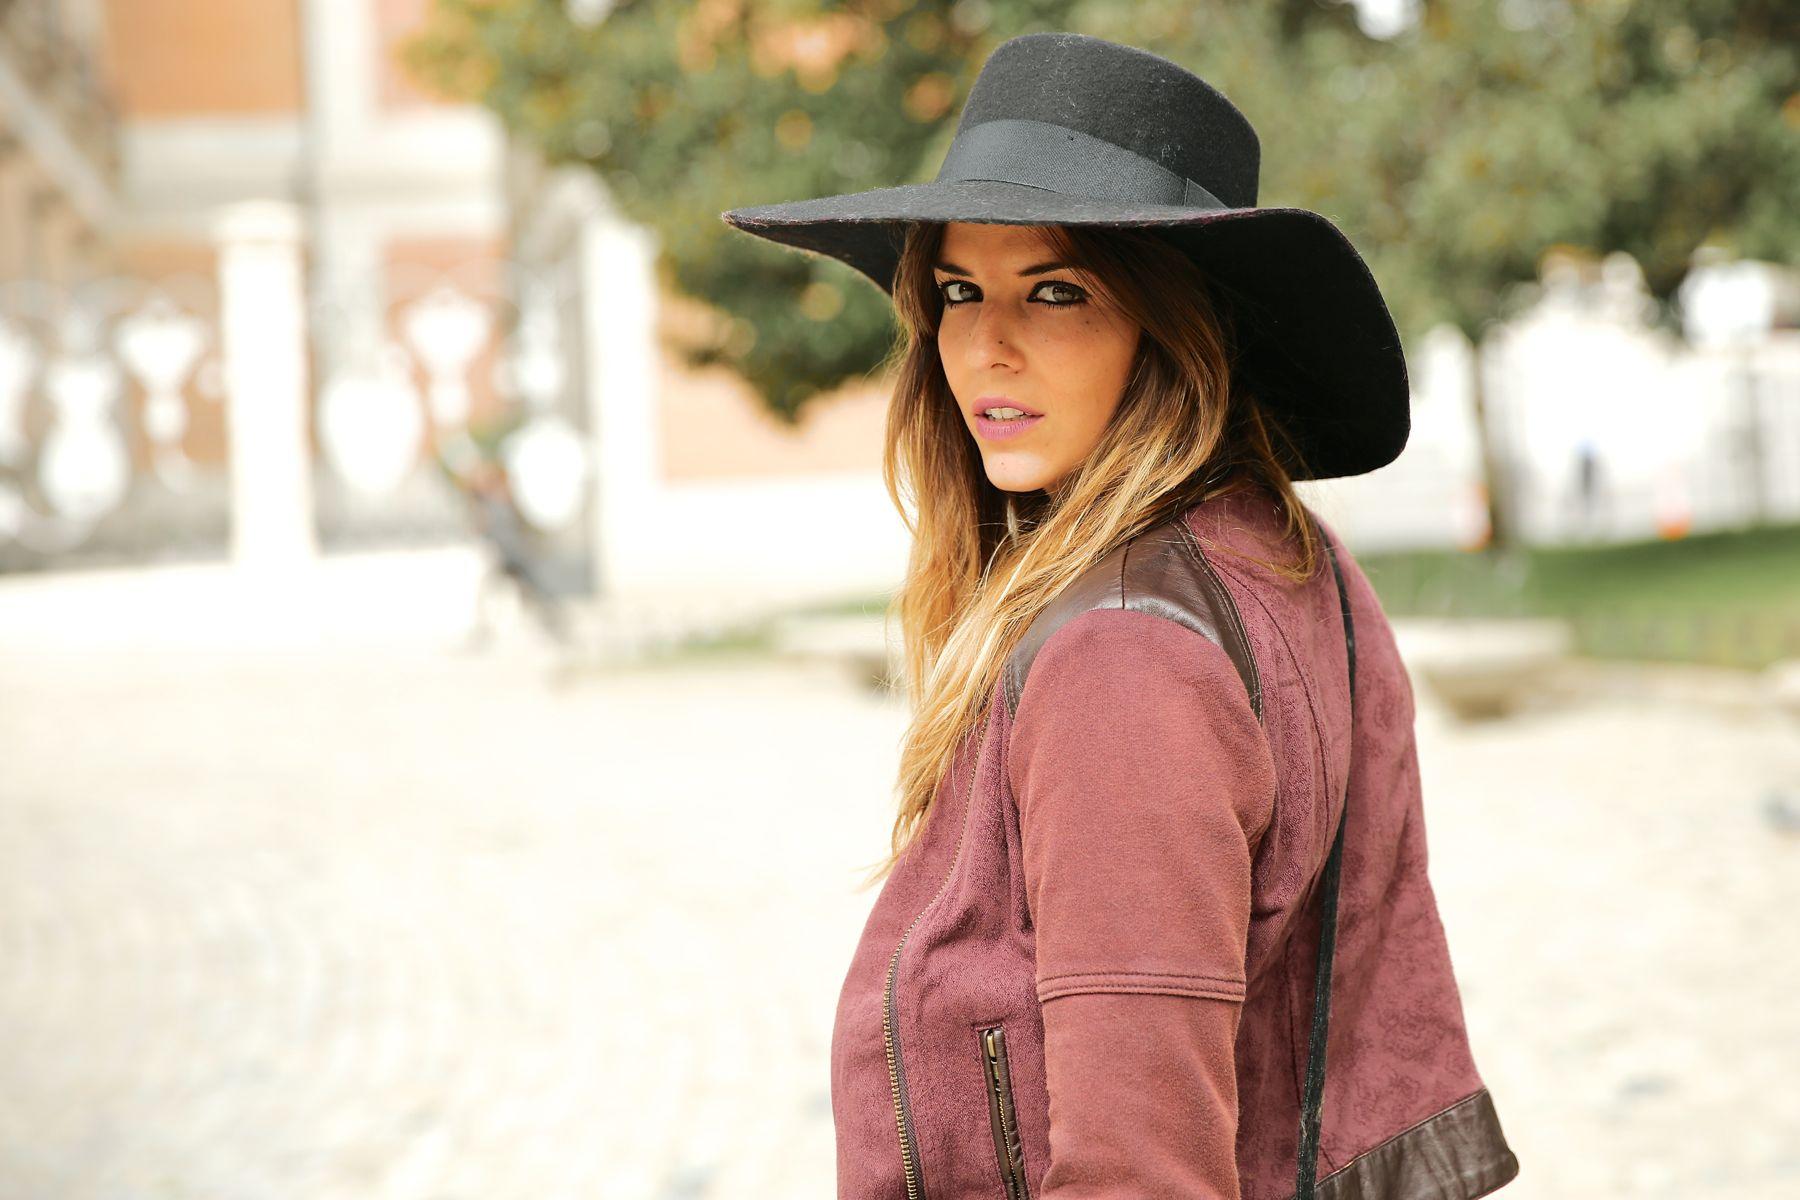 trendy_taste-look-outfit-street_style-ootd-blog-blogger-fashion_spain-moda_españa-AD-adolfo_dominguez-amaia_salamanca-boho-hippie-sombrero-hat-biker-flecos-fringes-3